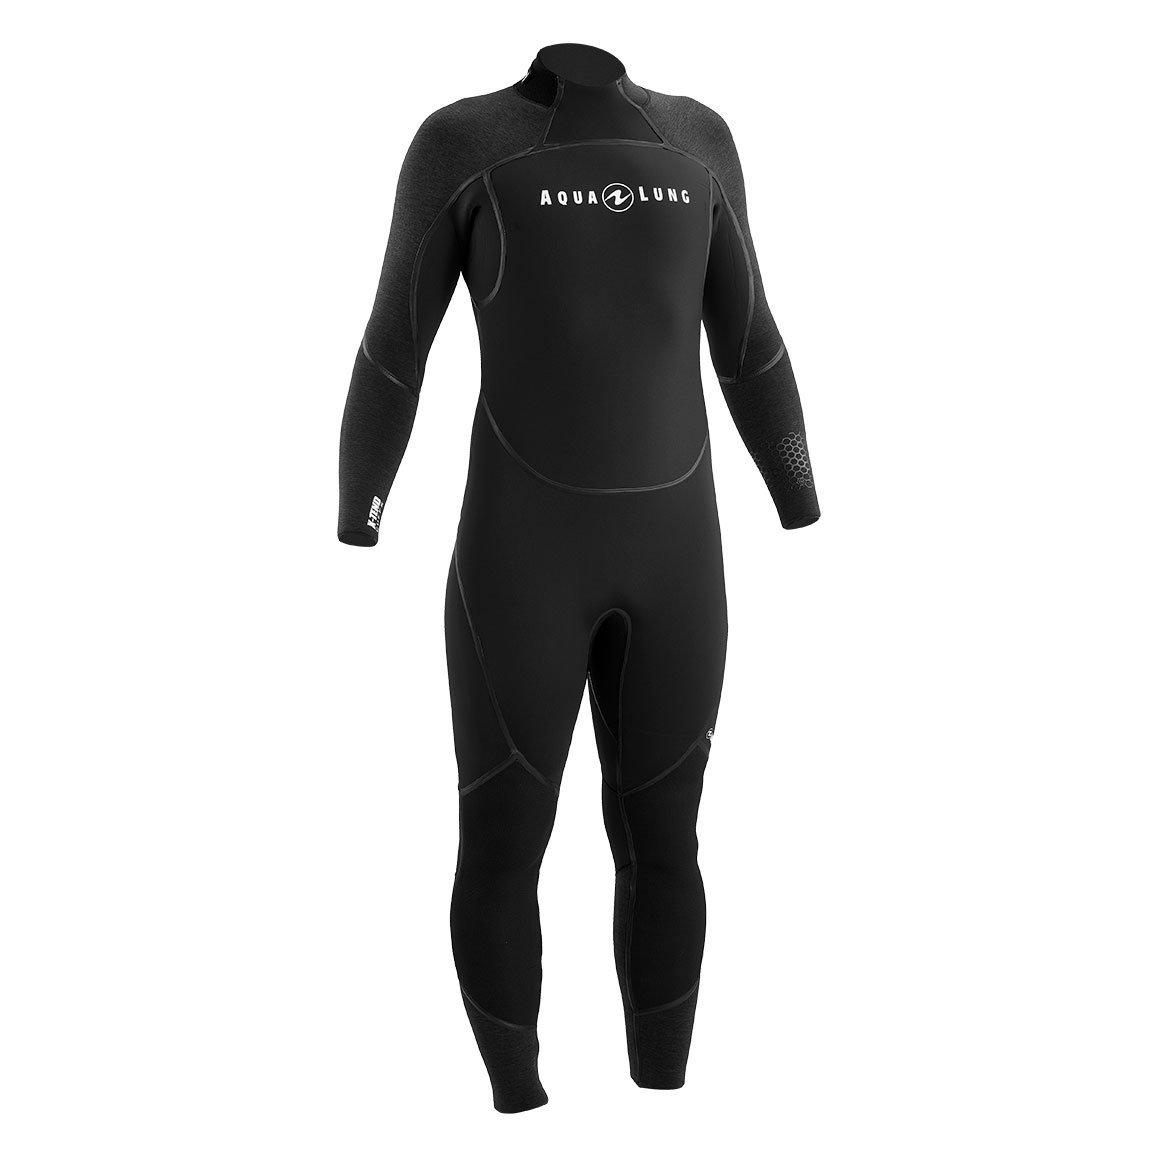 Wetsuit 3mm Aquaflex Men's Black/Charcoal